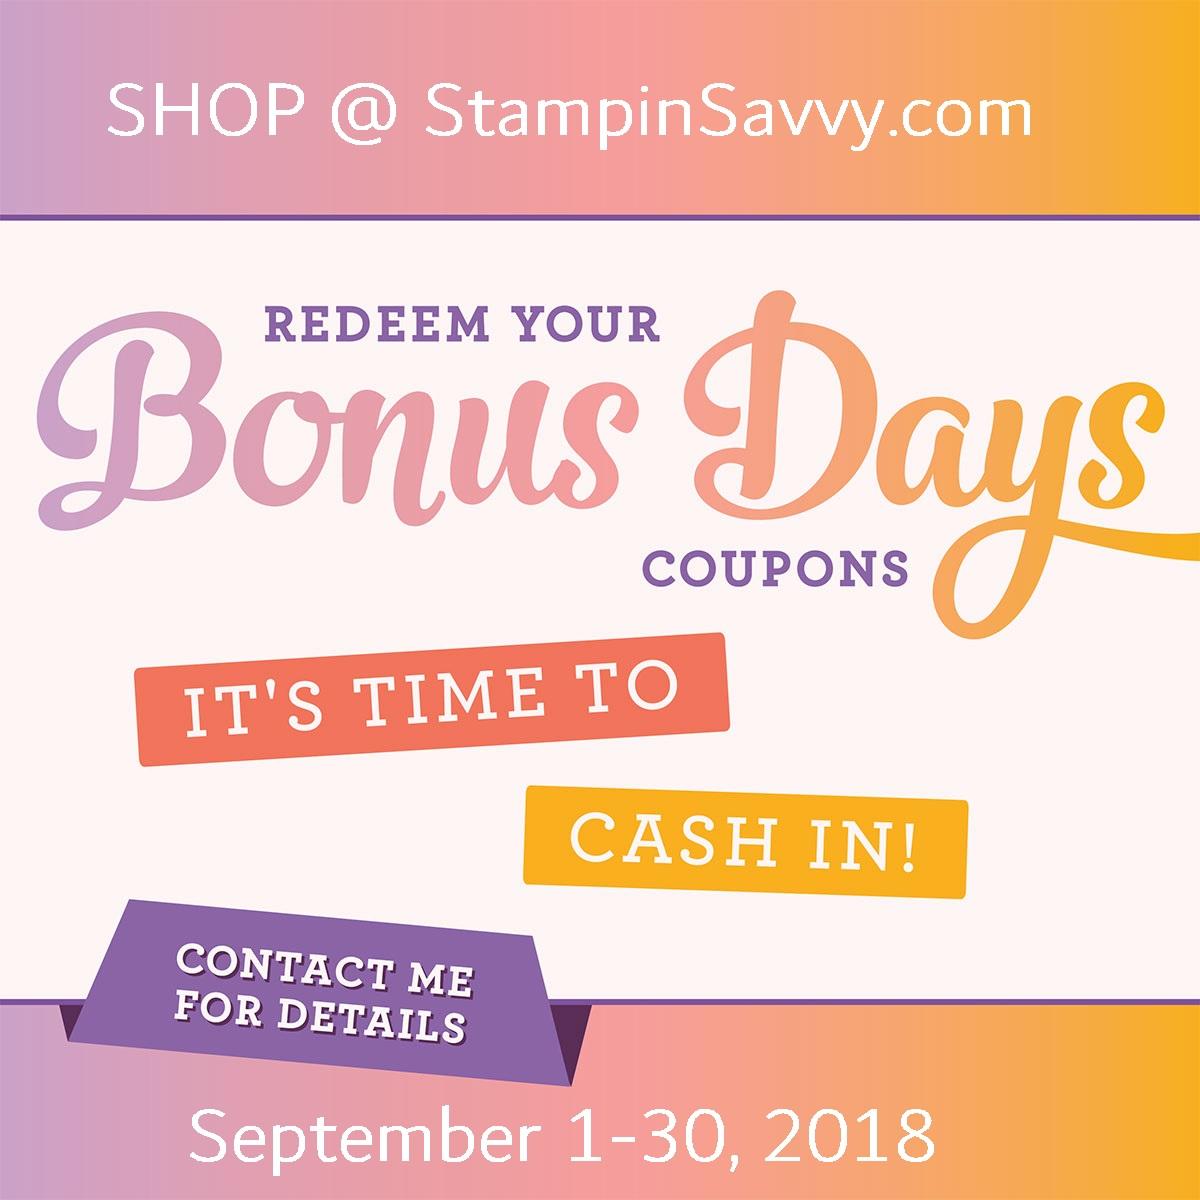 redeem bonus day coupons at stampinsavvy.com